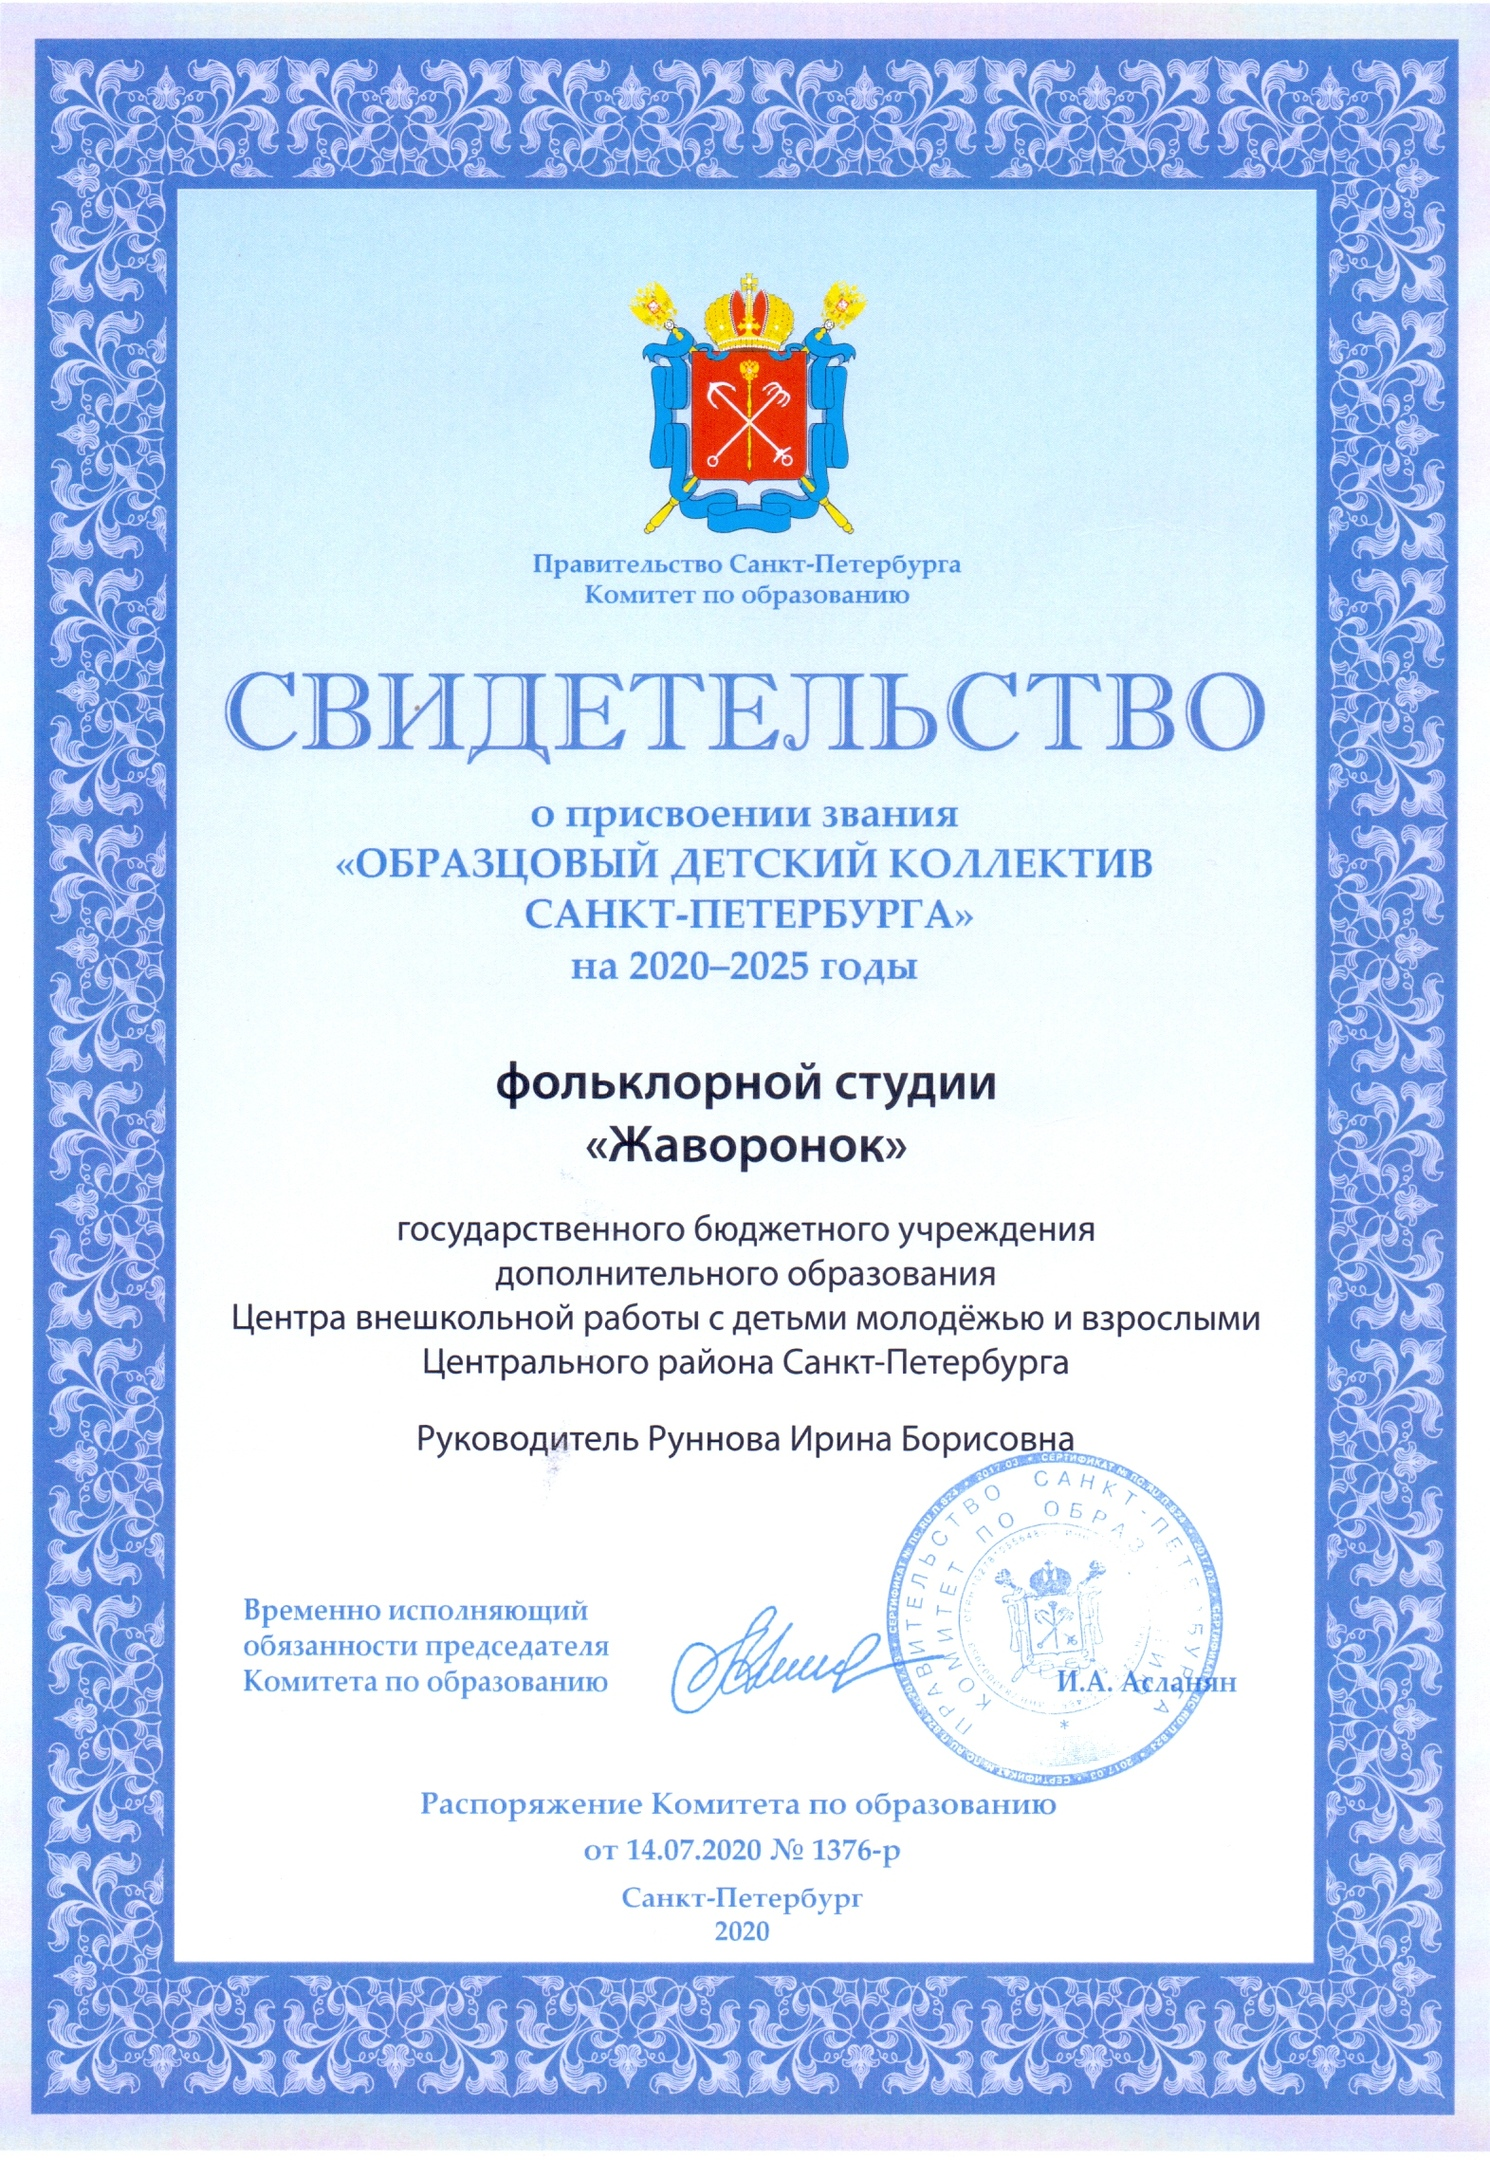 jaH8SkcKv5U